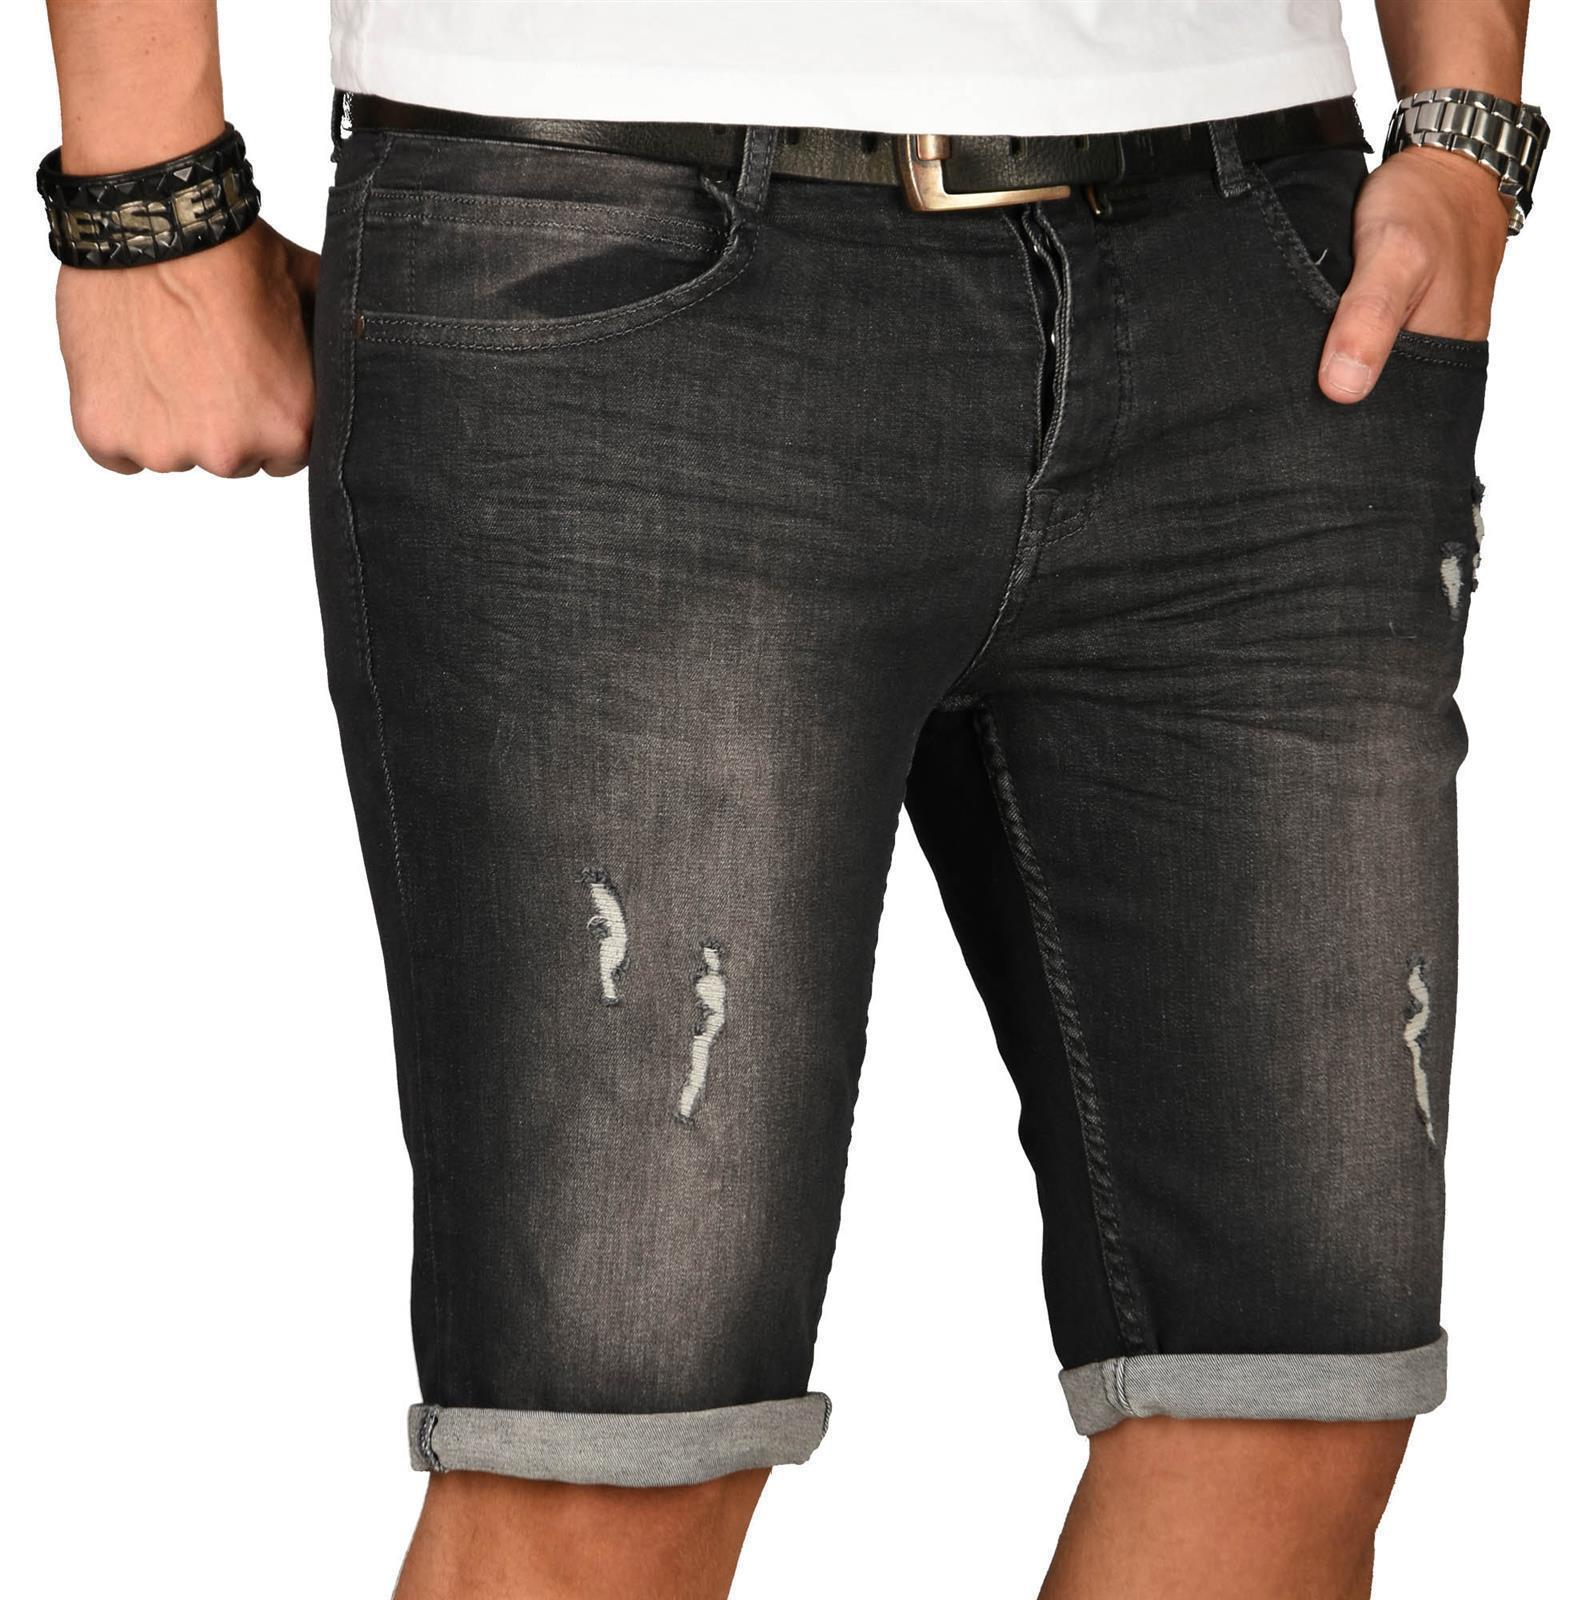 A-Salvarini-Herren-Designer-Jeans-Short-kurze-Hose-Slim-Sommer-Shorts-Washed Indexbild 47